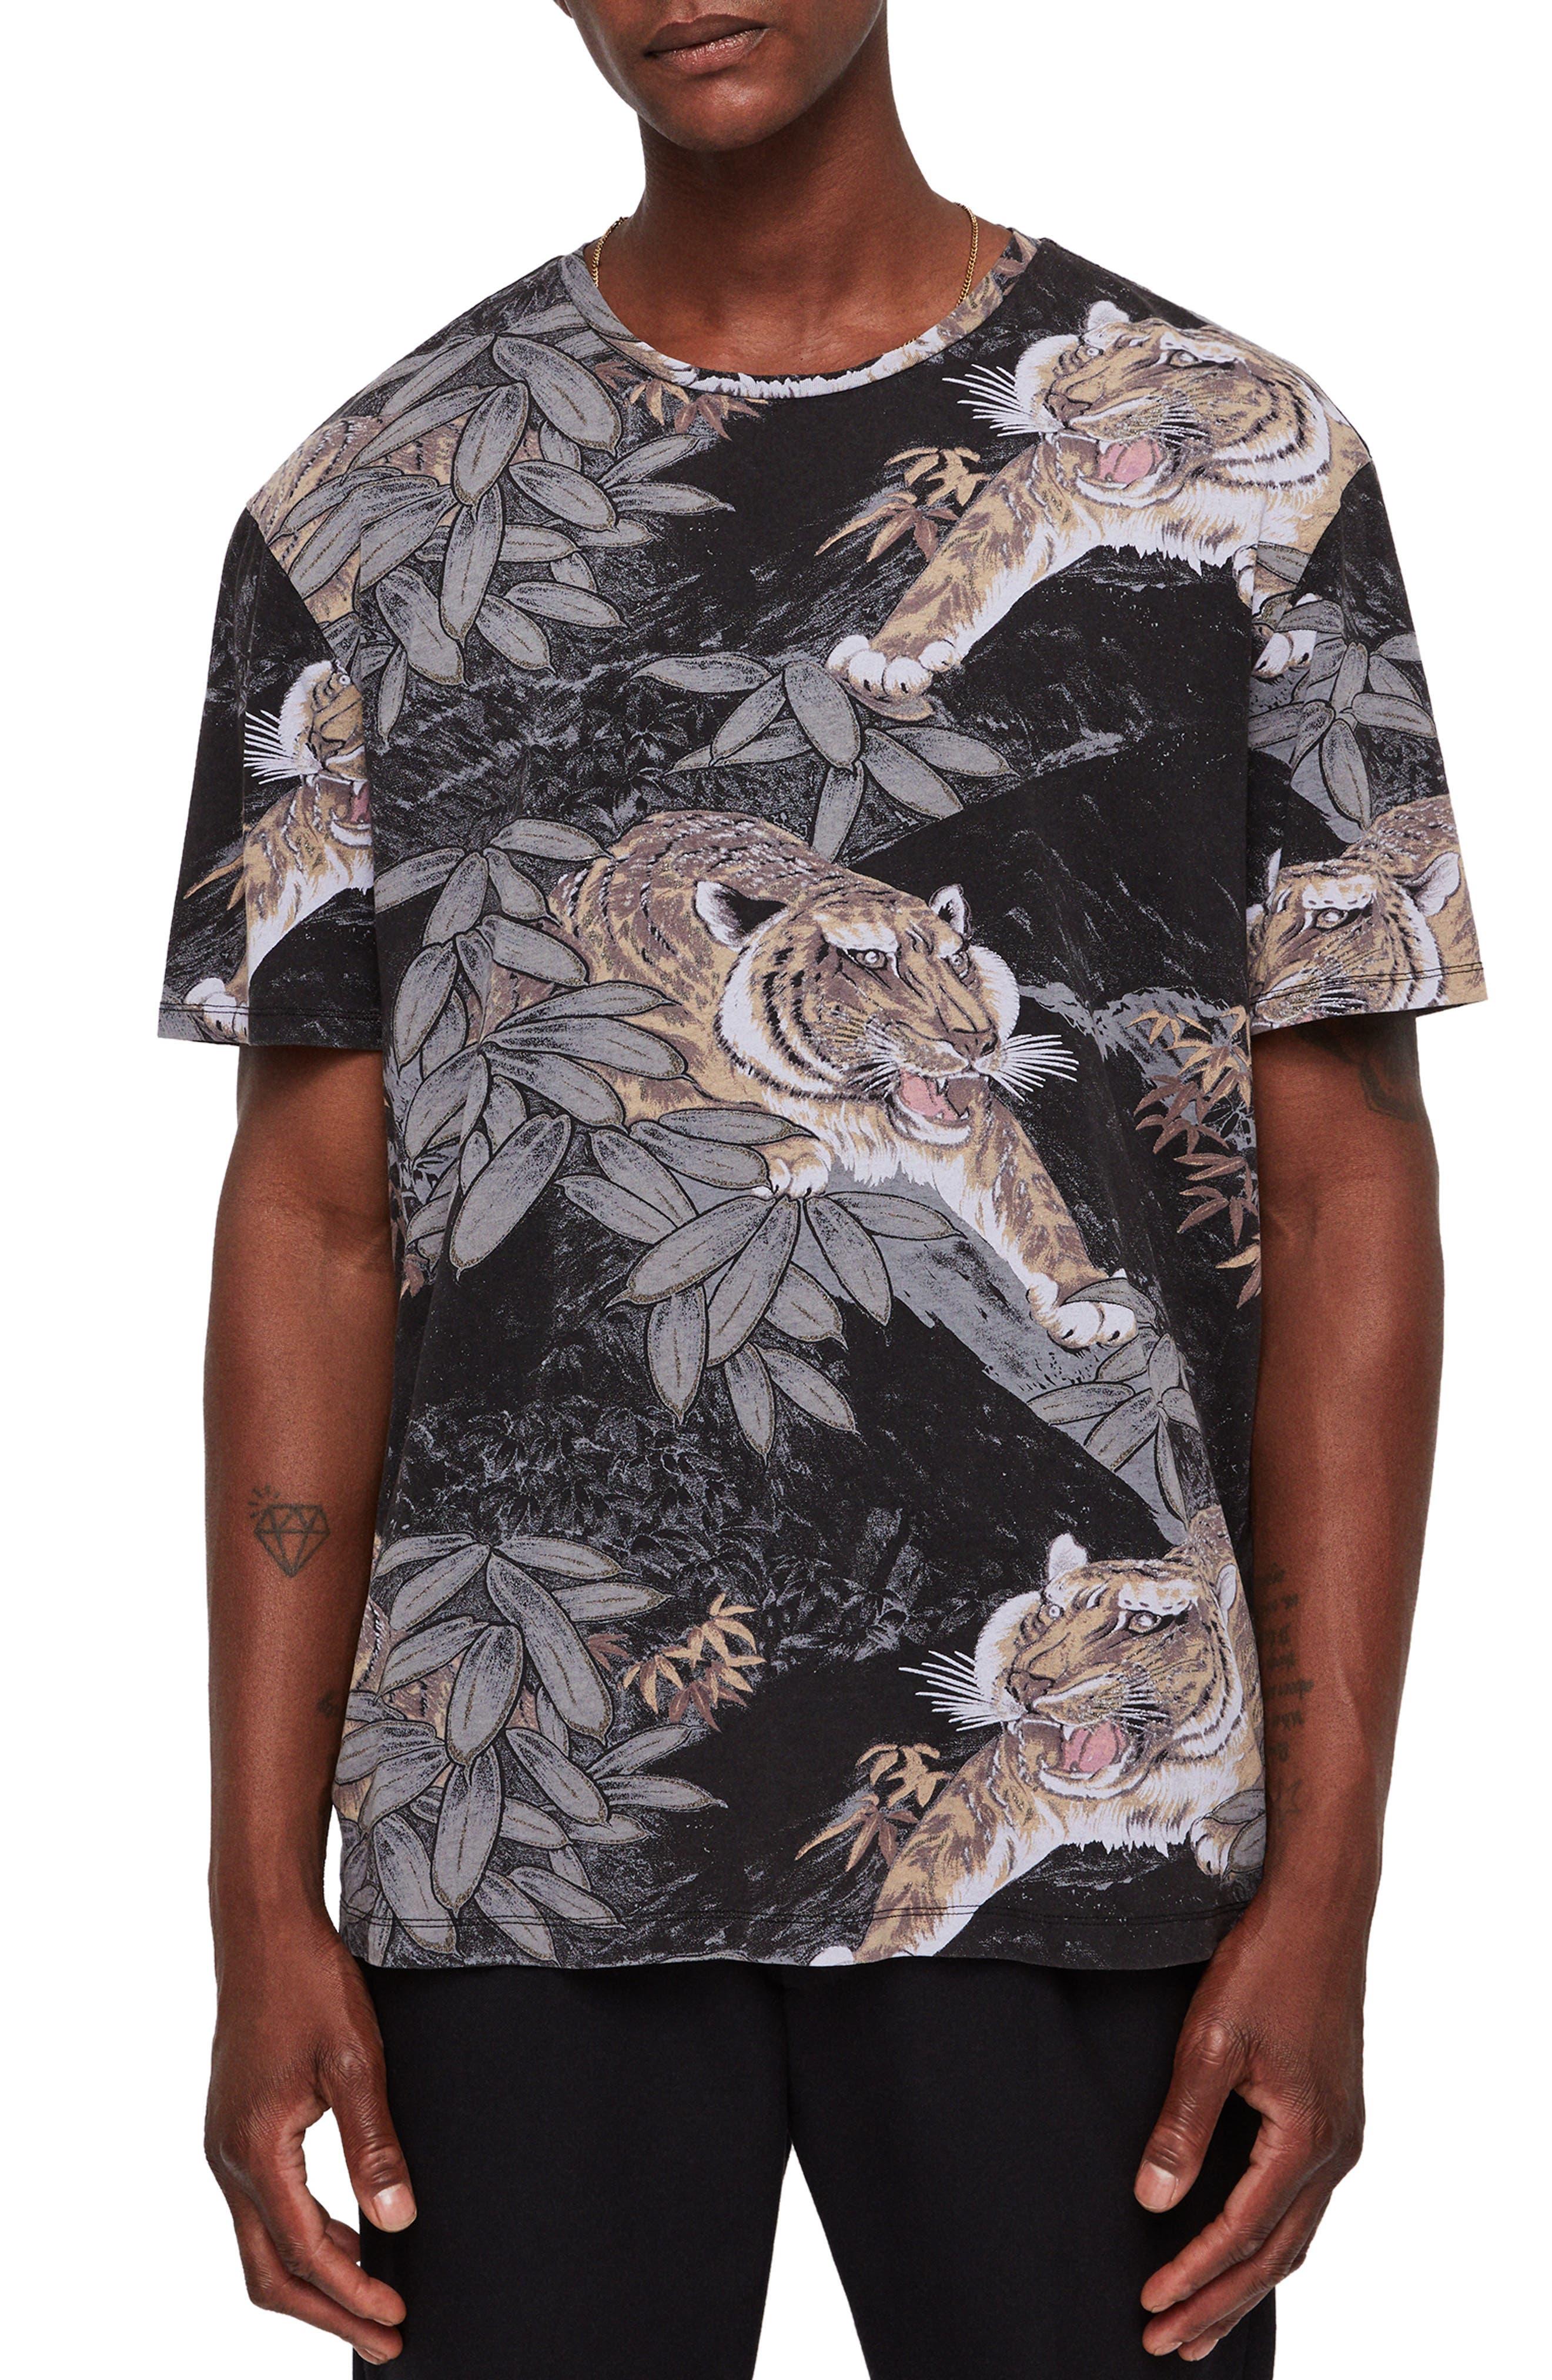 Chokai Slim Fit T-Shirt,                         Main,                         color, 004